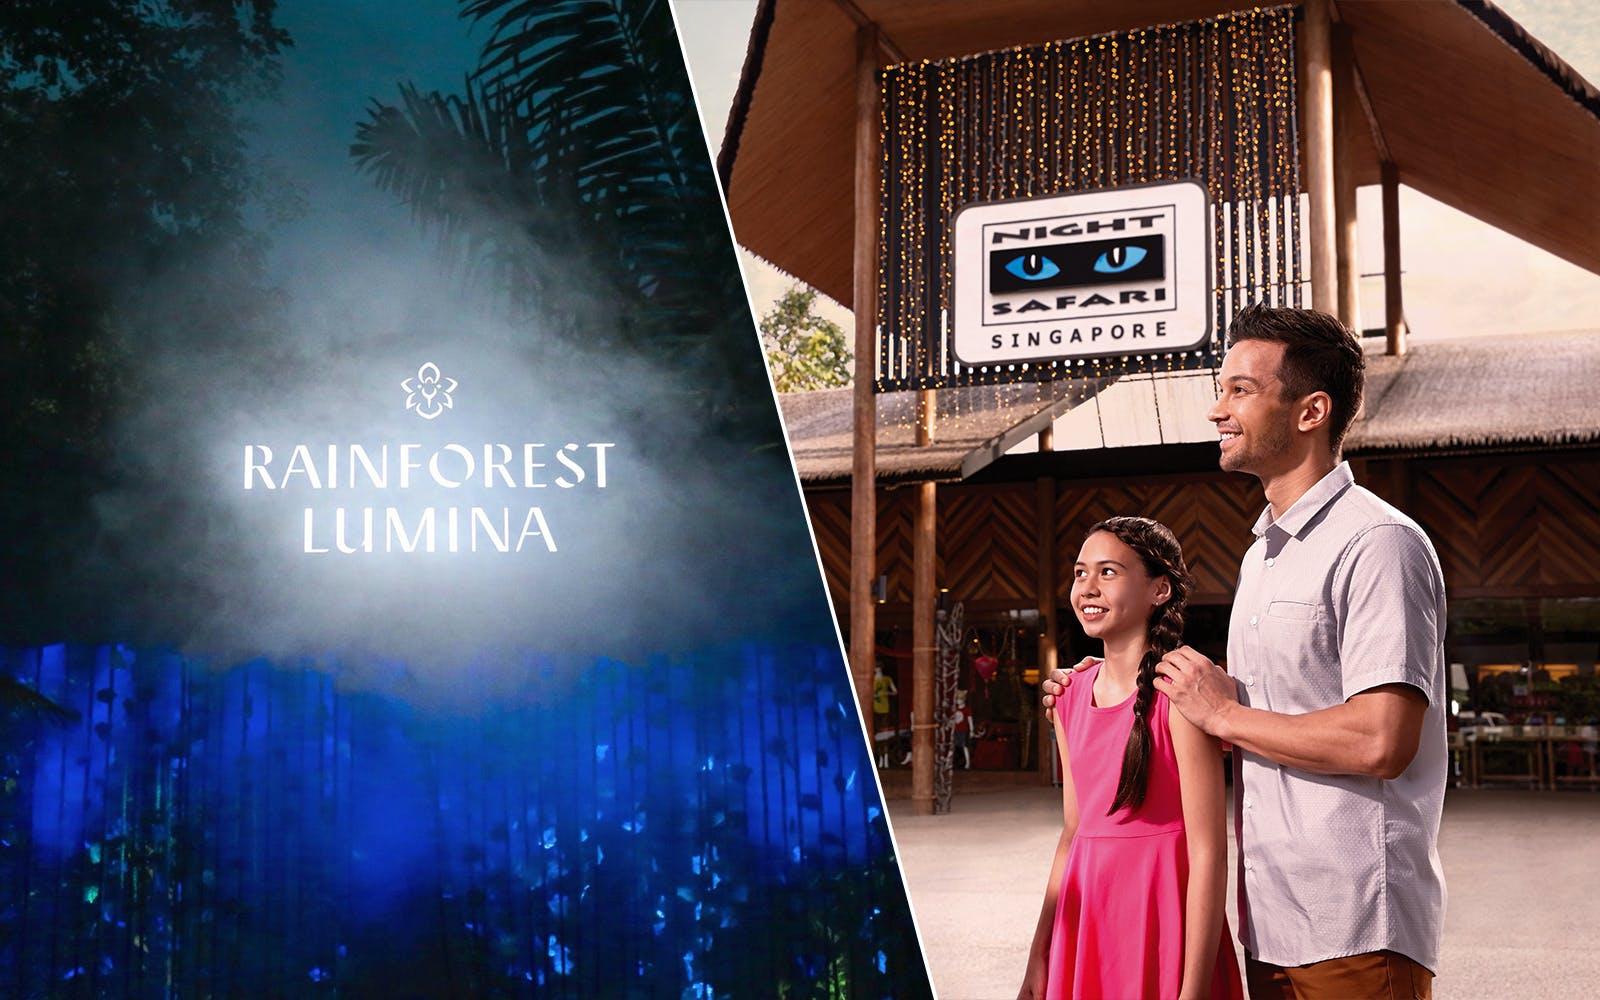 rainforest lumina + Night Safari